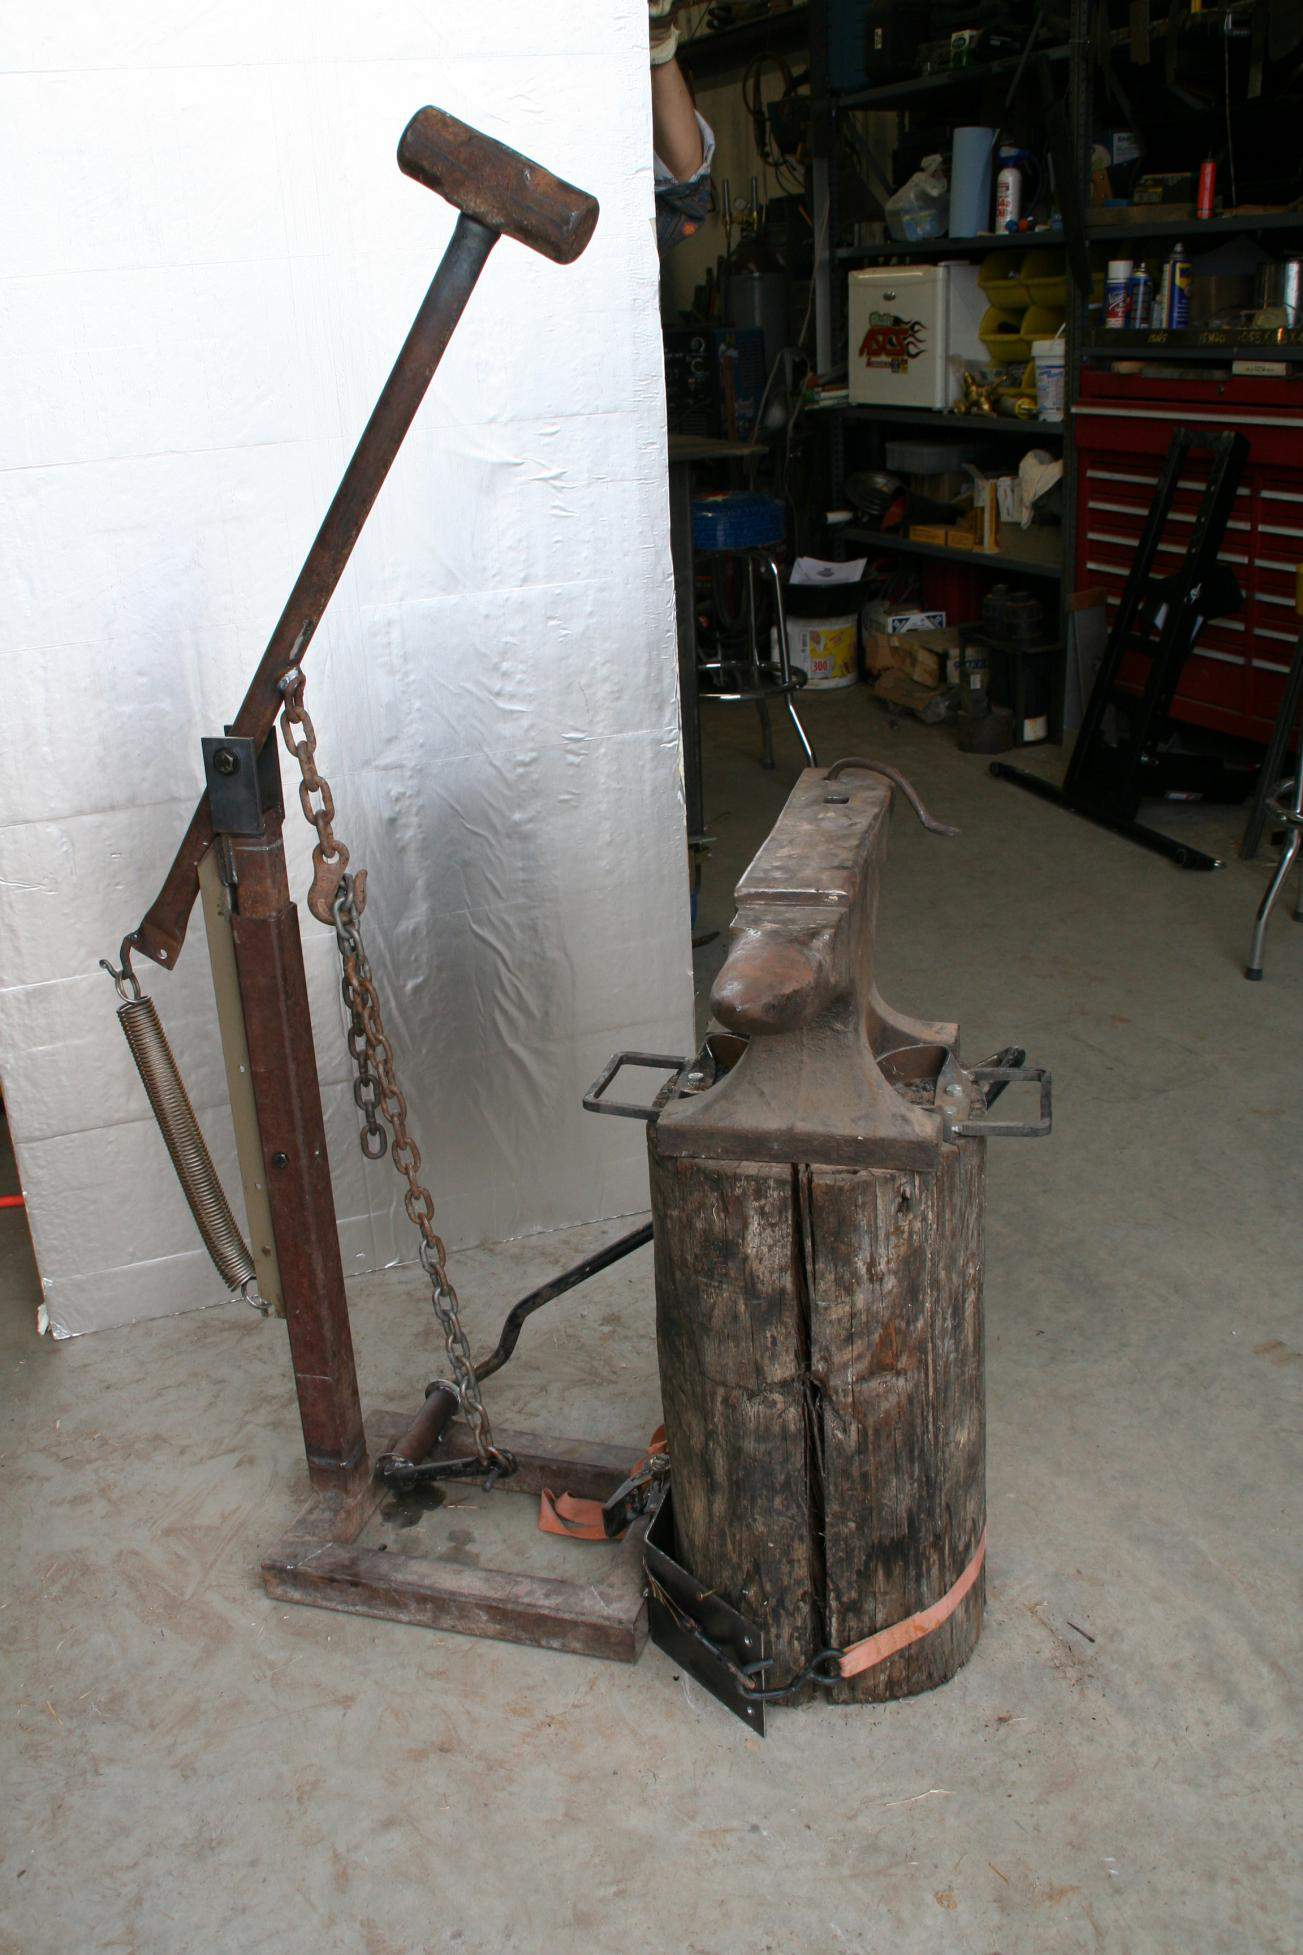 Treadle hammer mechanics? - Page 2 - Power Hammers, Treadle